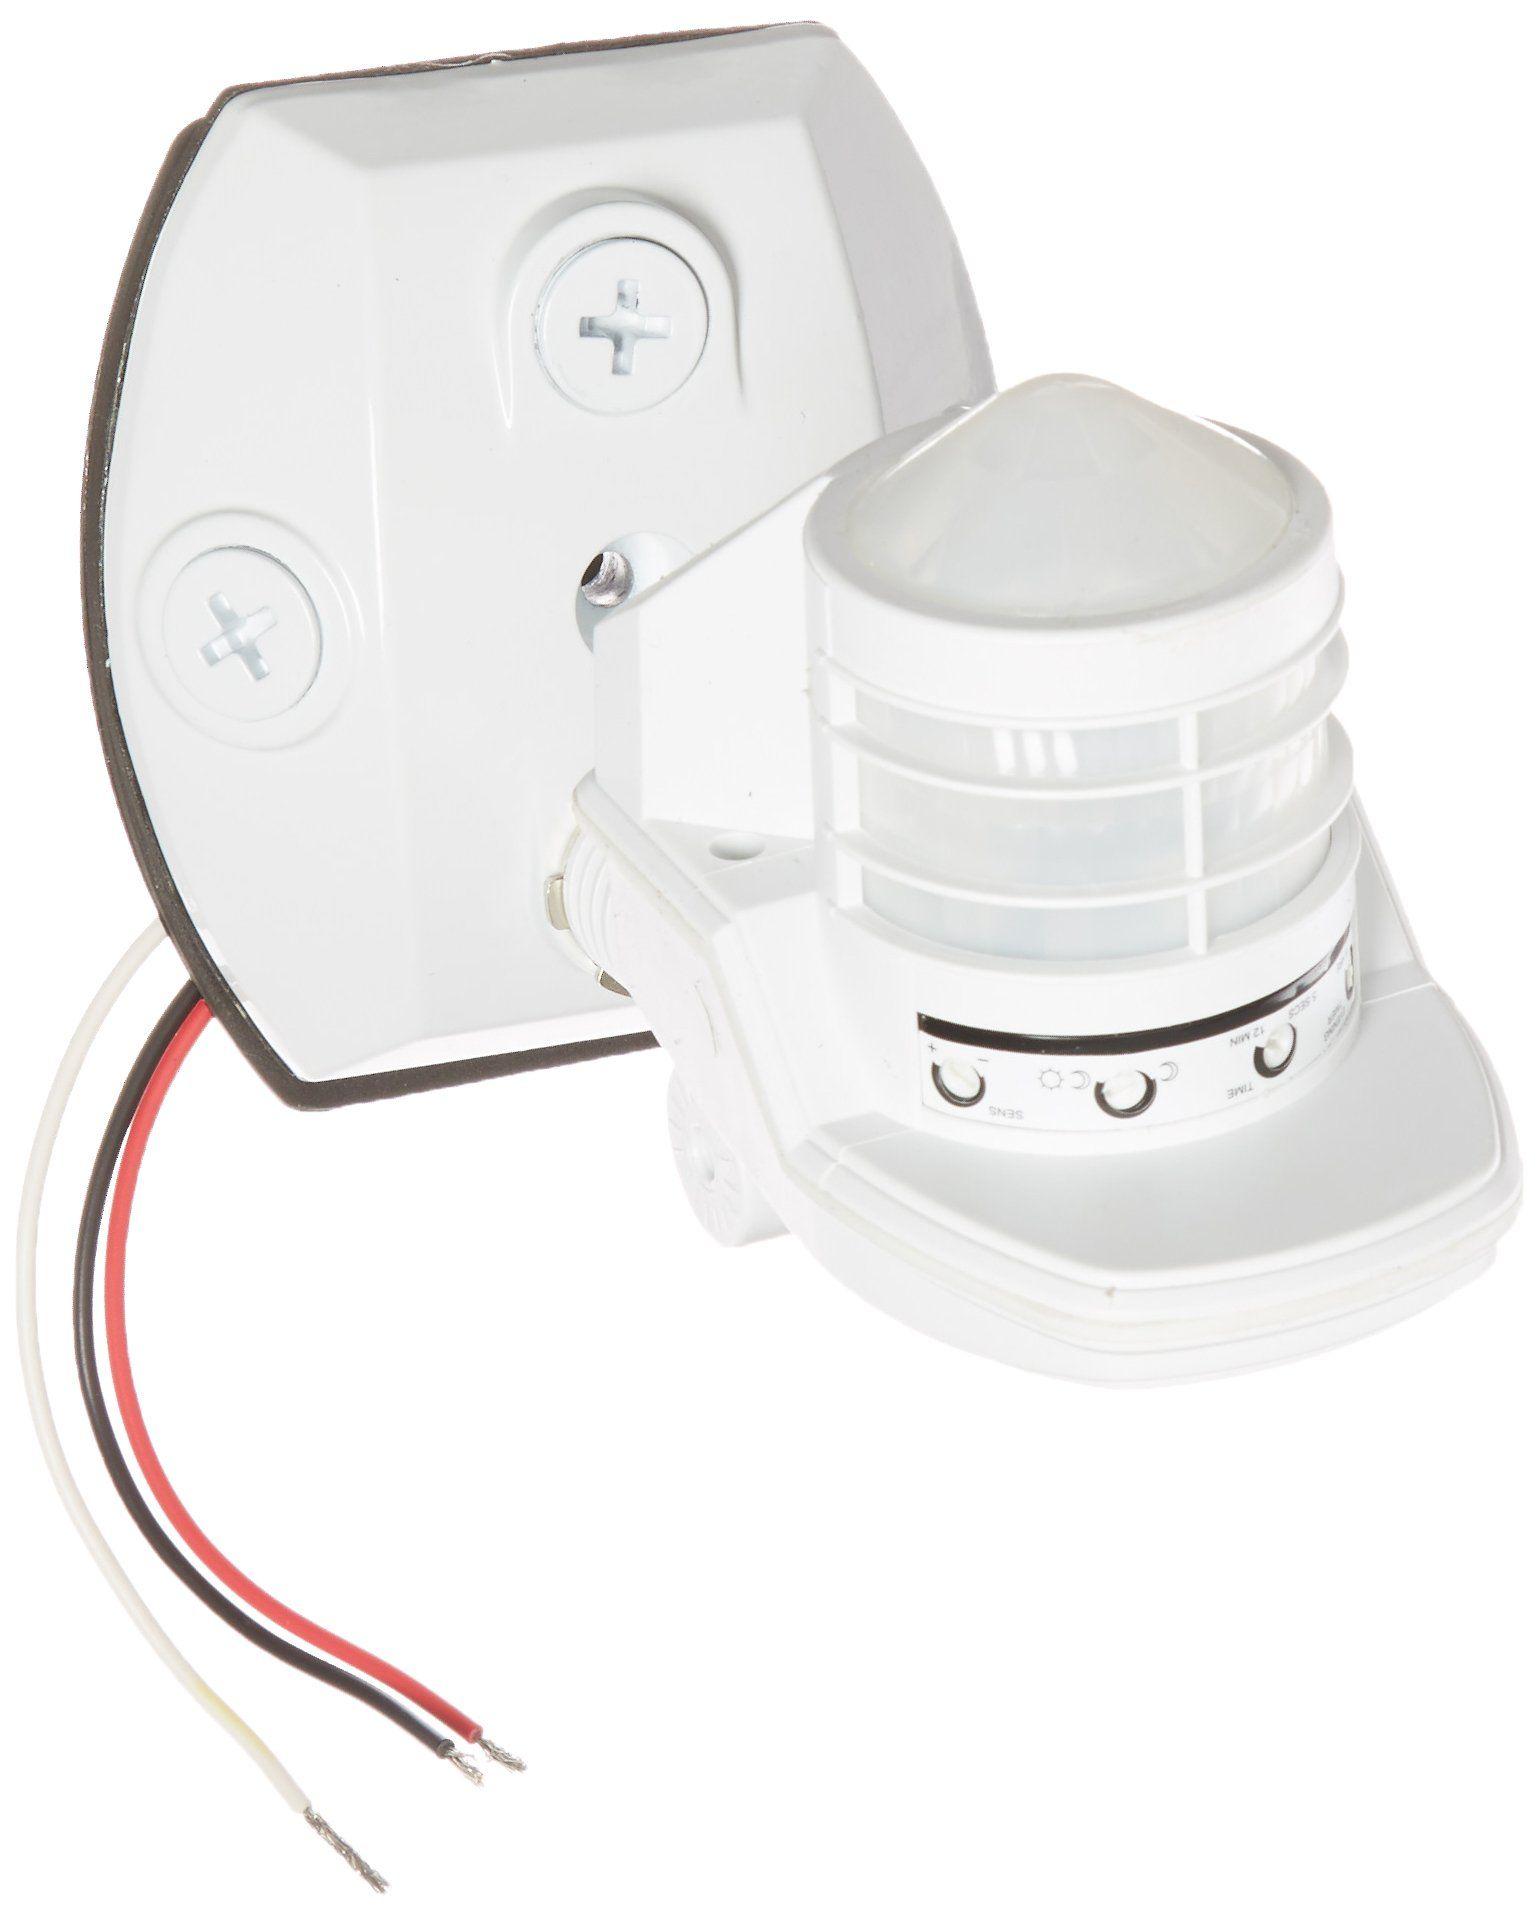 Rab Motion Security Light: RAB Lighting STL360W Super Stealth 360 Sensor, 360 Degrees